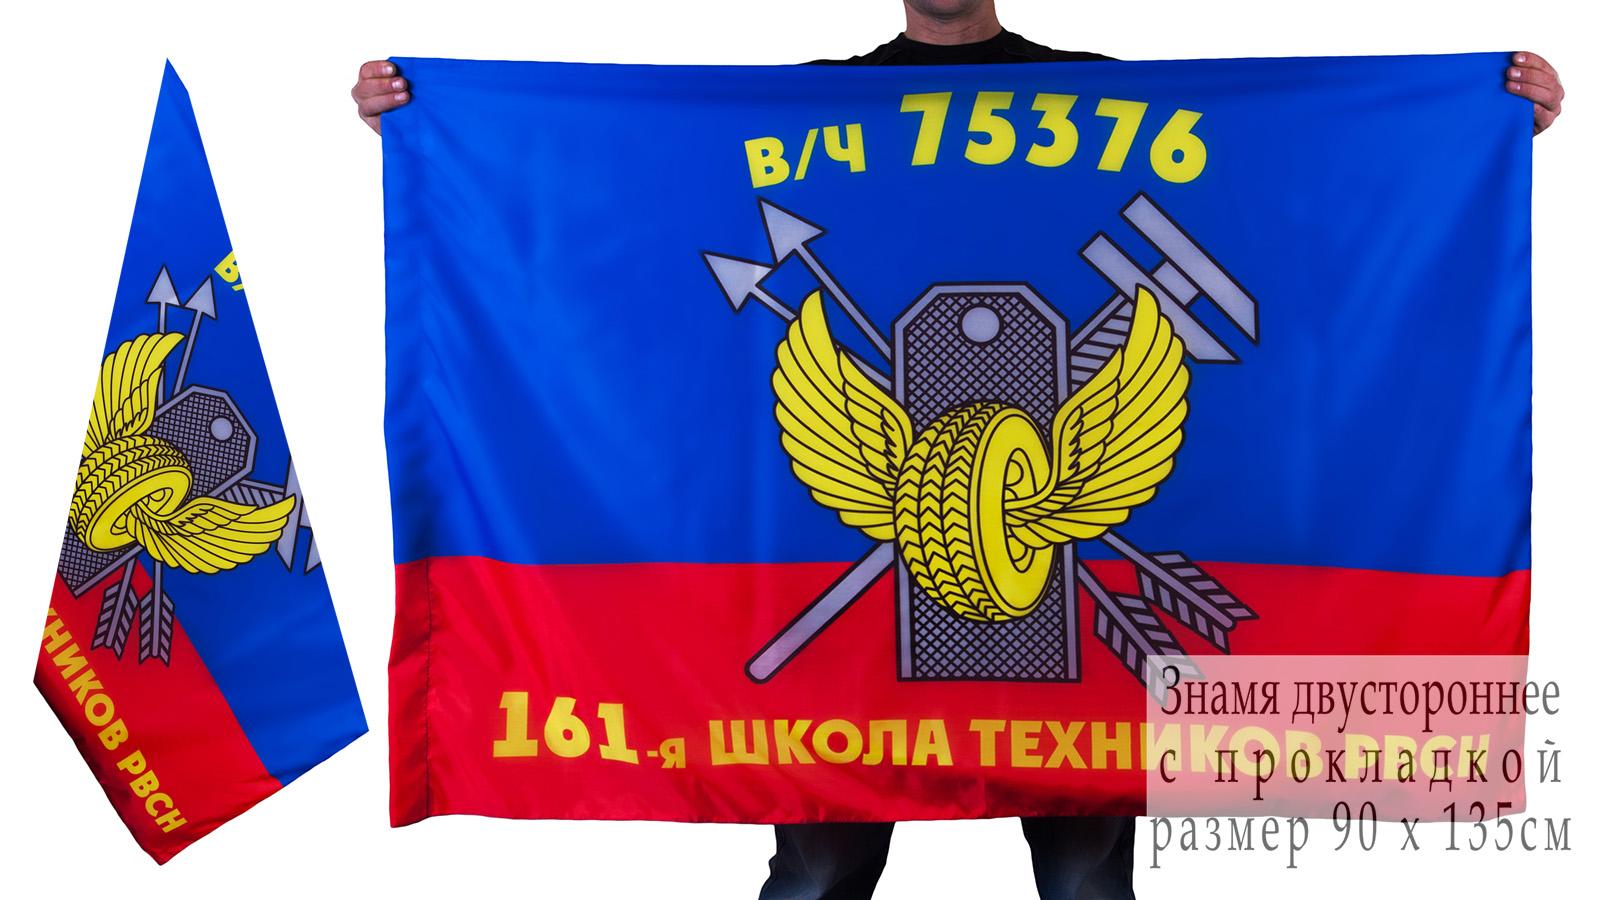 Знамя 161-ой школы техников РВСН